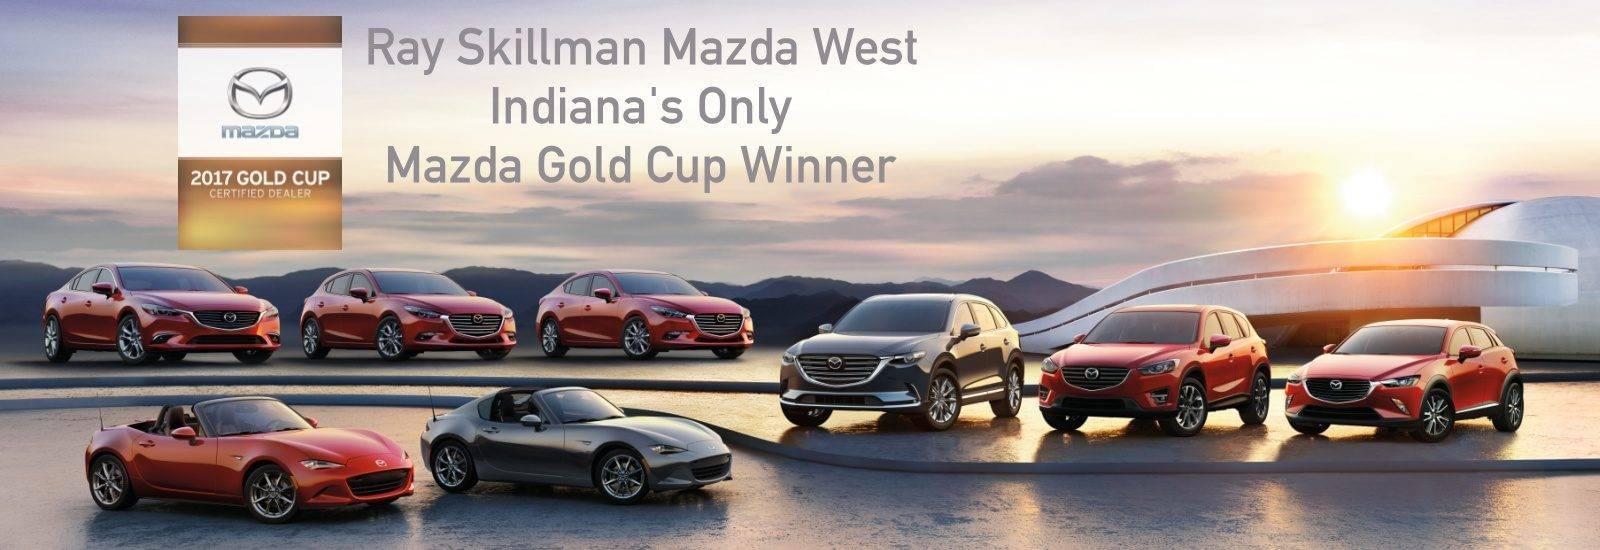 Ray Skillman Hyundai U003eu003e Mazda Dealer In Indianapolis Ray Skillman Westside  Mazda | Upcomingcarshq.